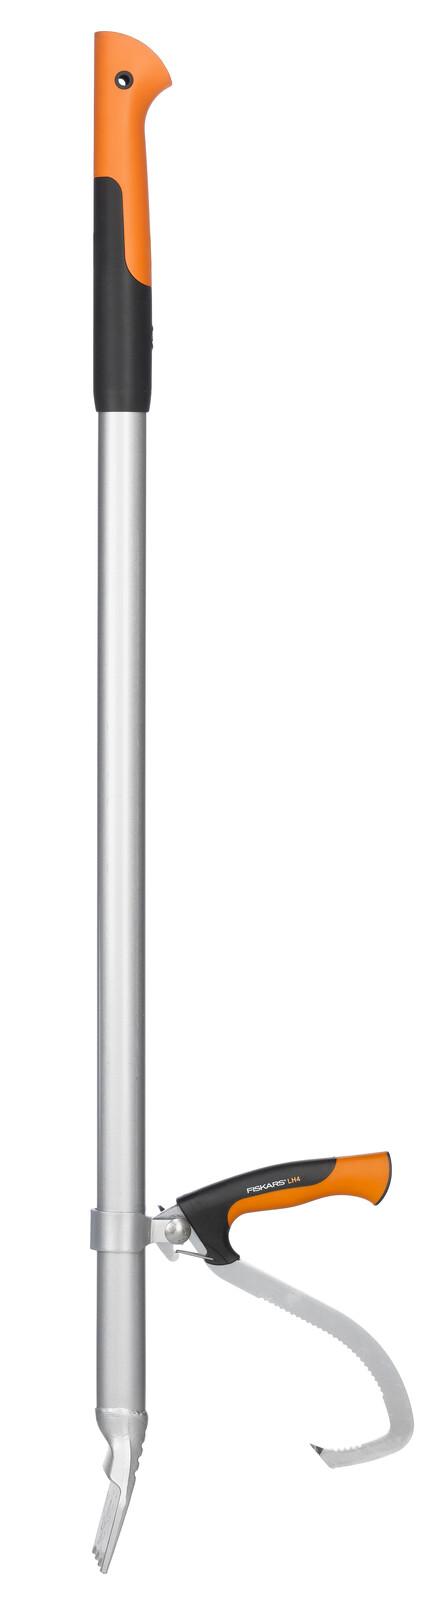 Fiskars Важіль для рубки дерев великий WoodXpert Felling Lever L, 115 см